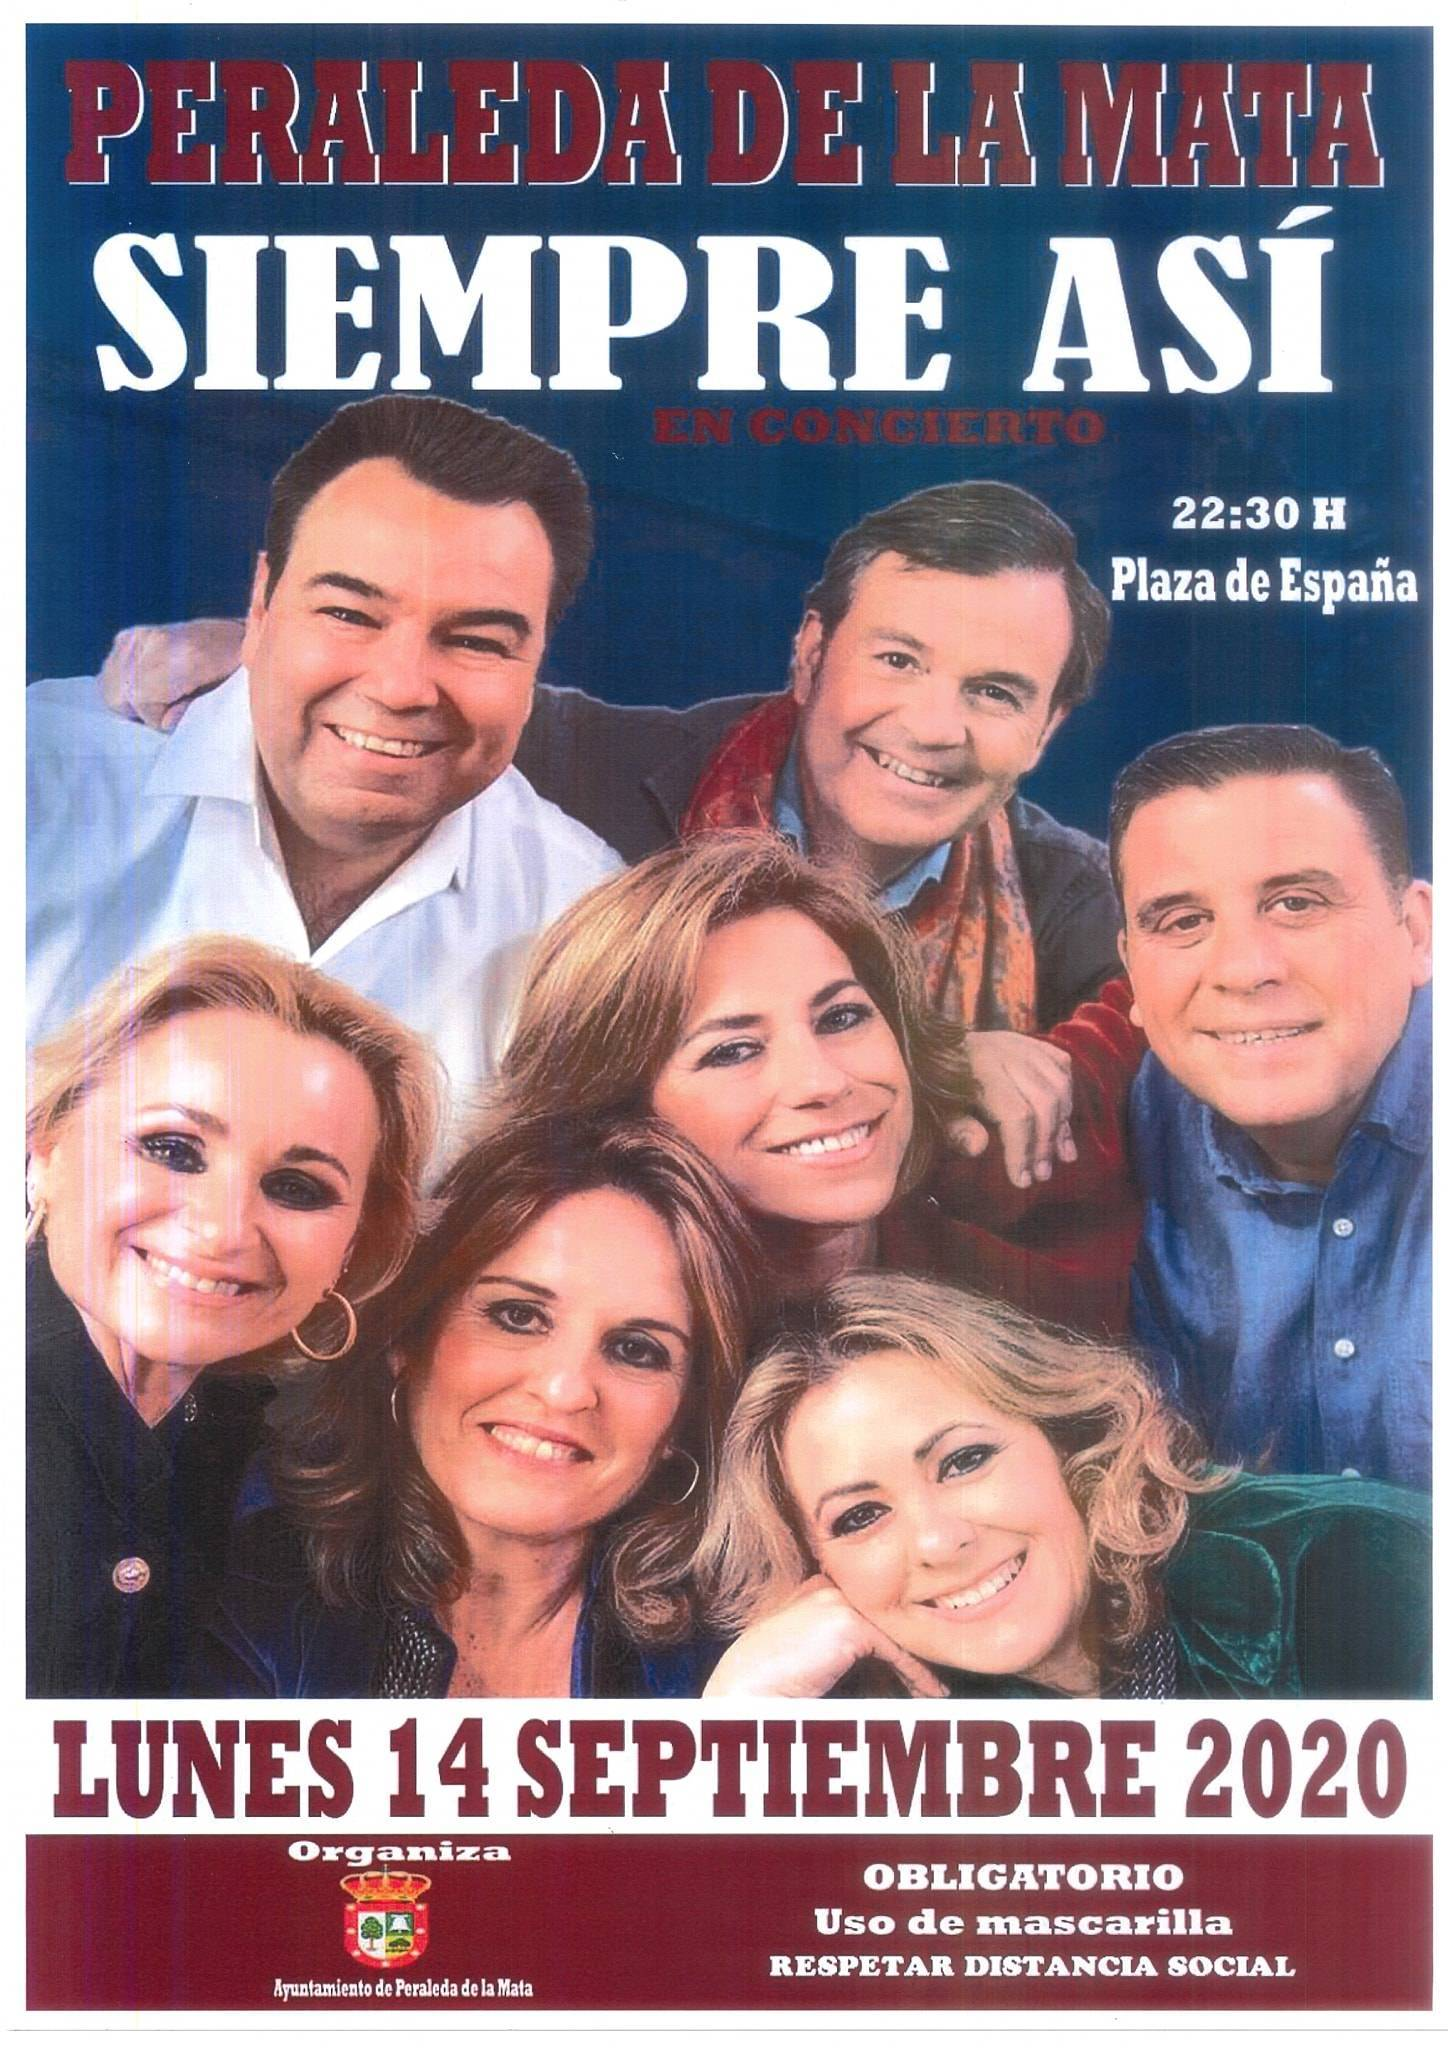 Siempre Así (2020) - Peraleda de la Mata (Cáceres)